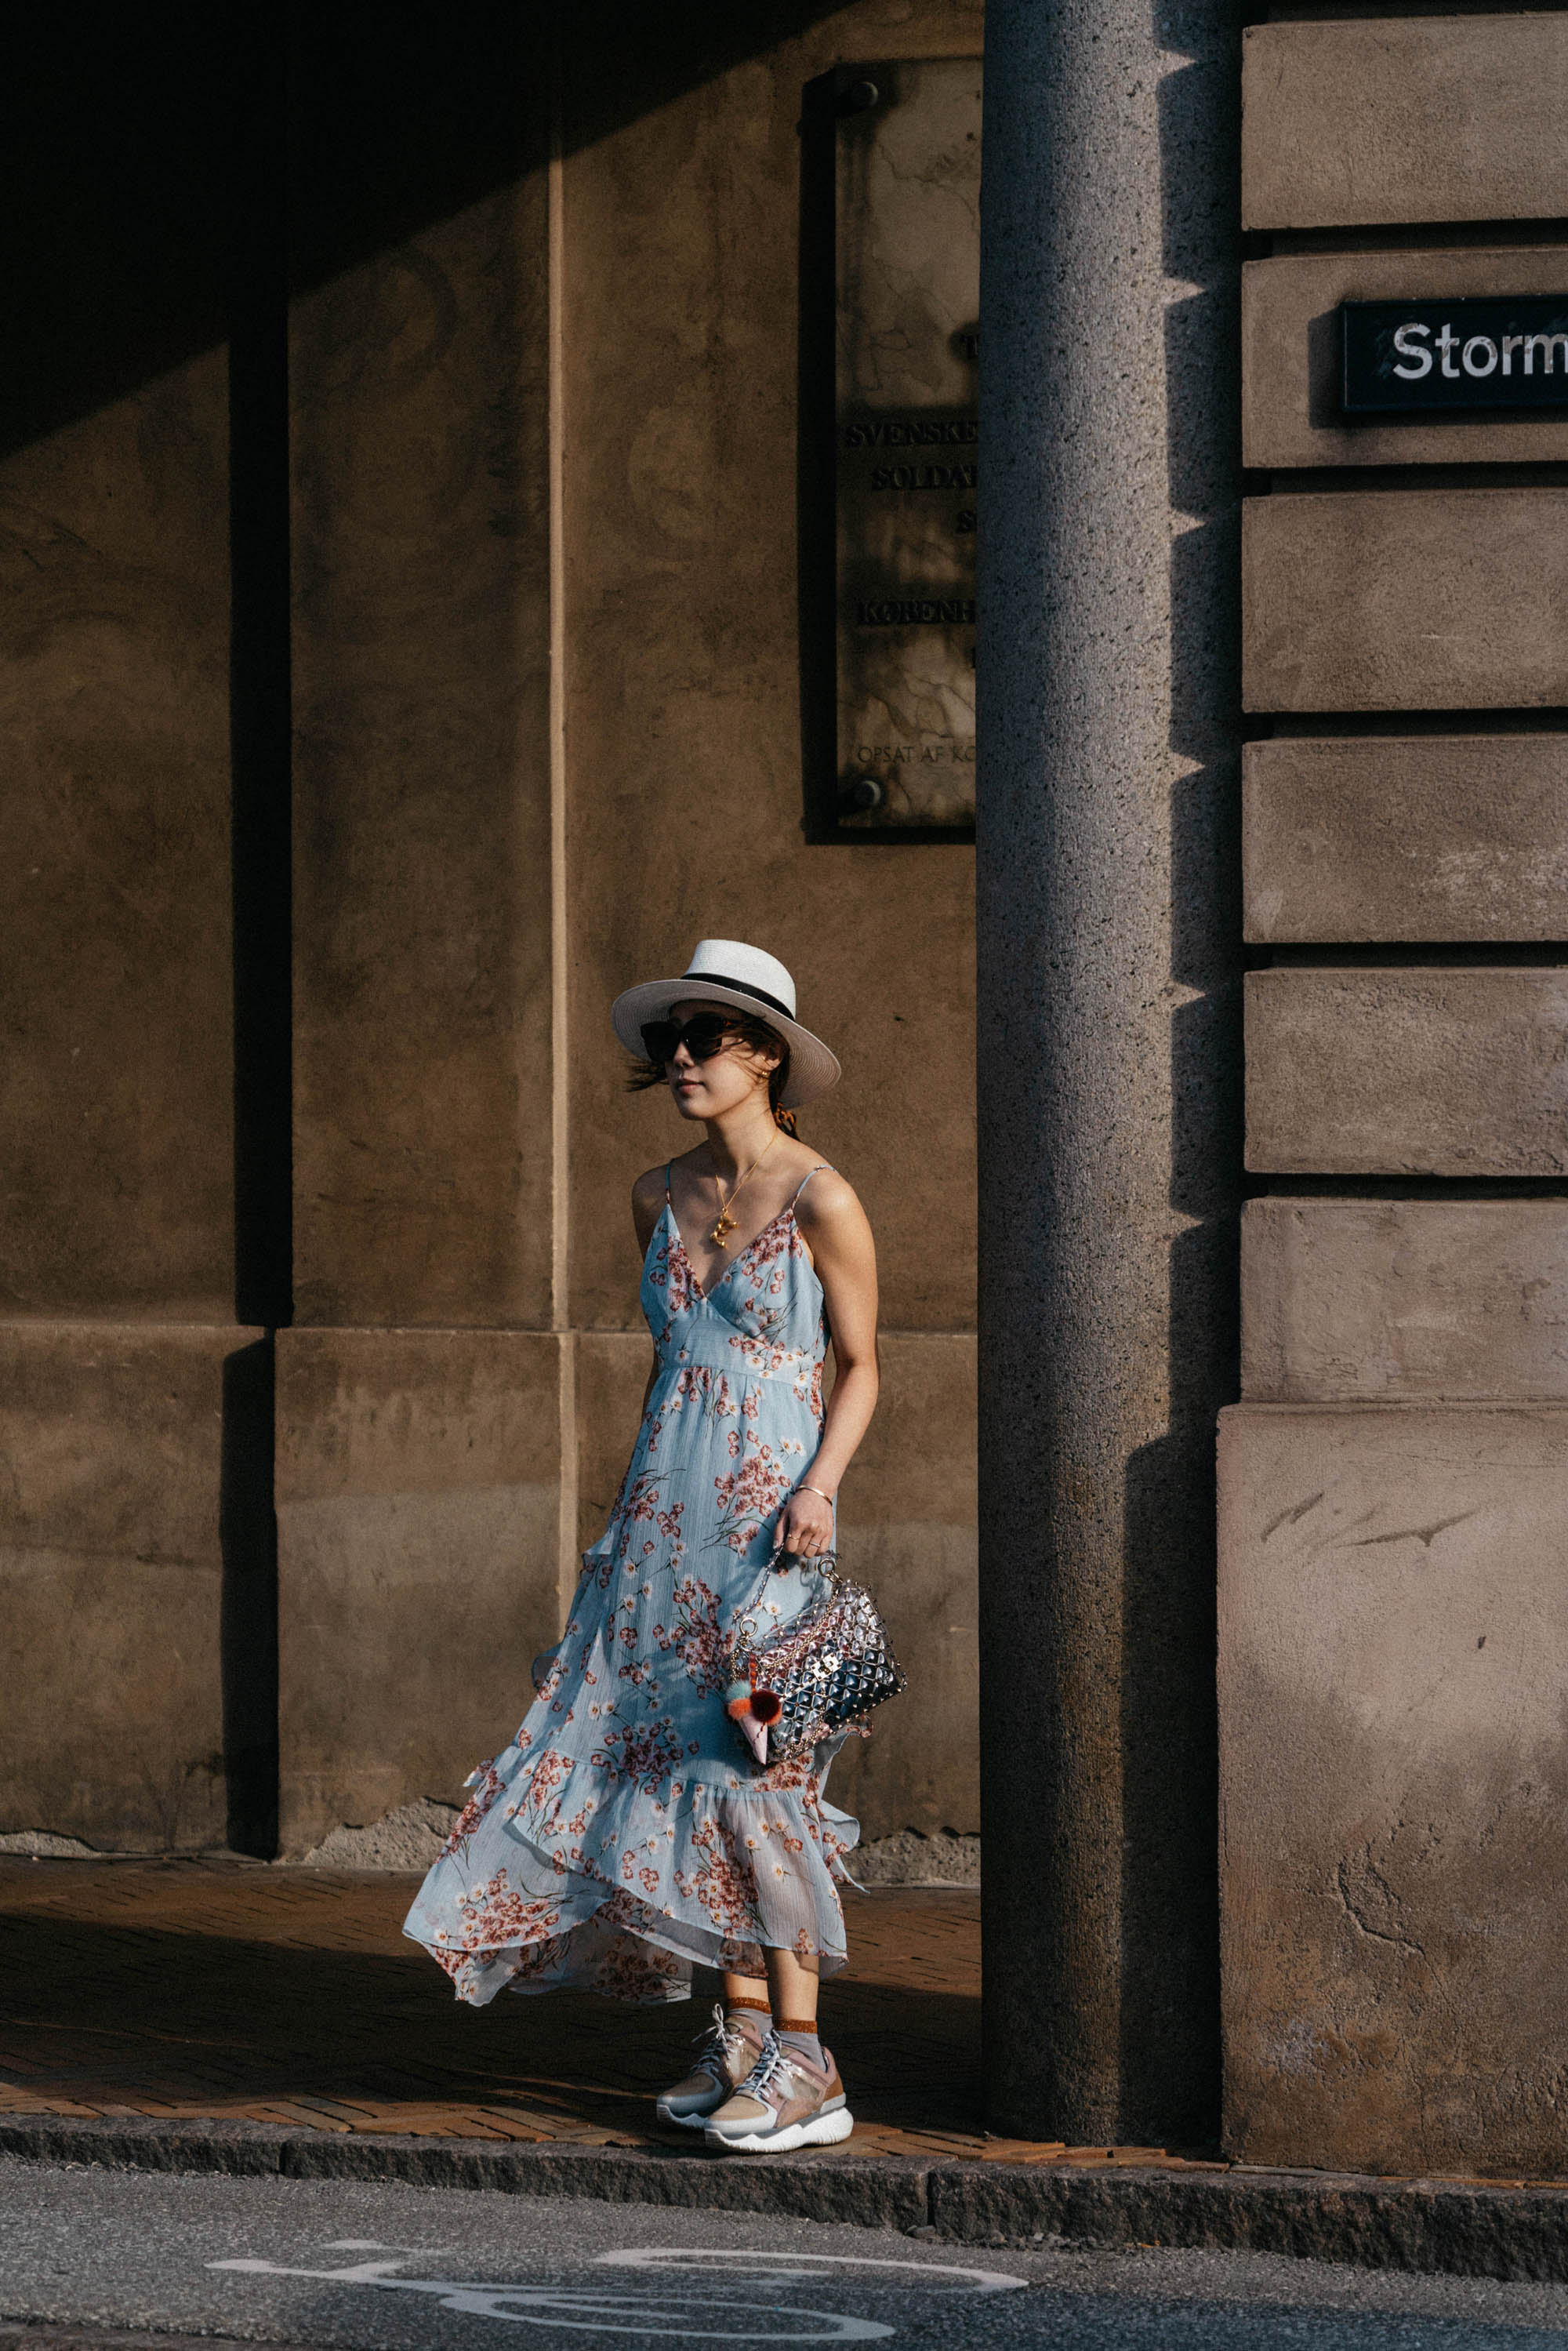 FiveSeventyFive Dress ,  Fendi Sneakers ,  Valentino Bag , Maison Michel Hat, Céline Necklace